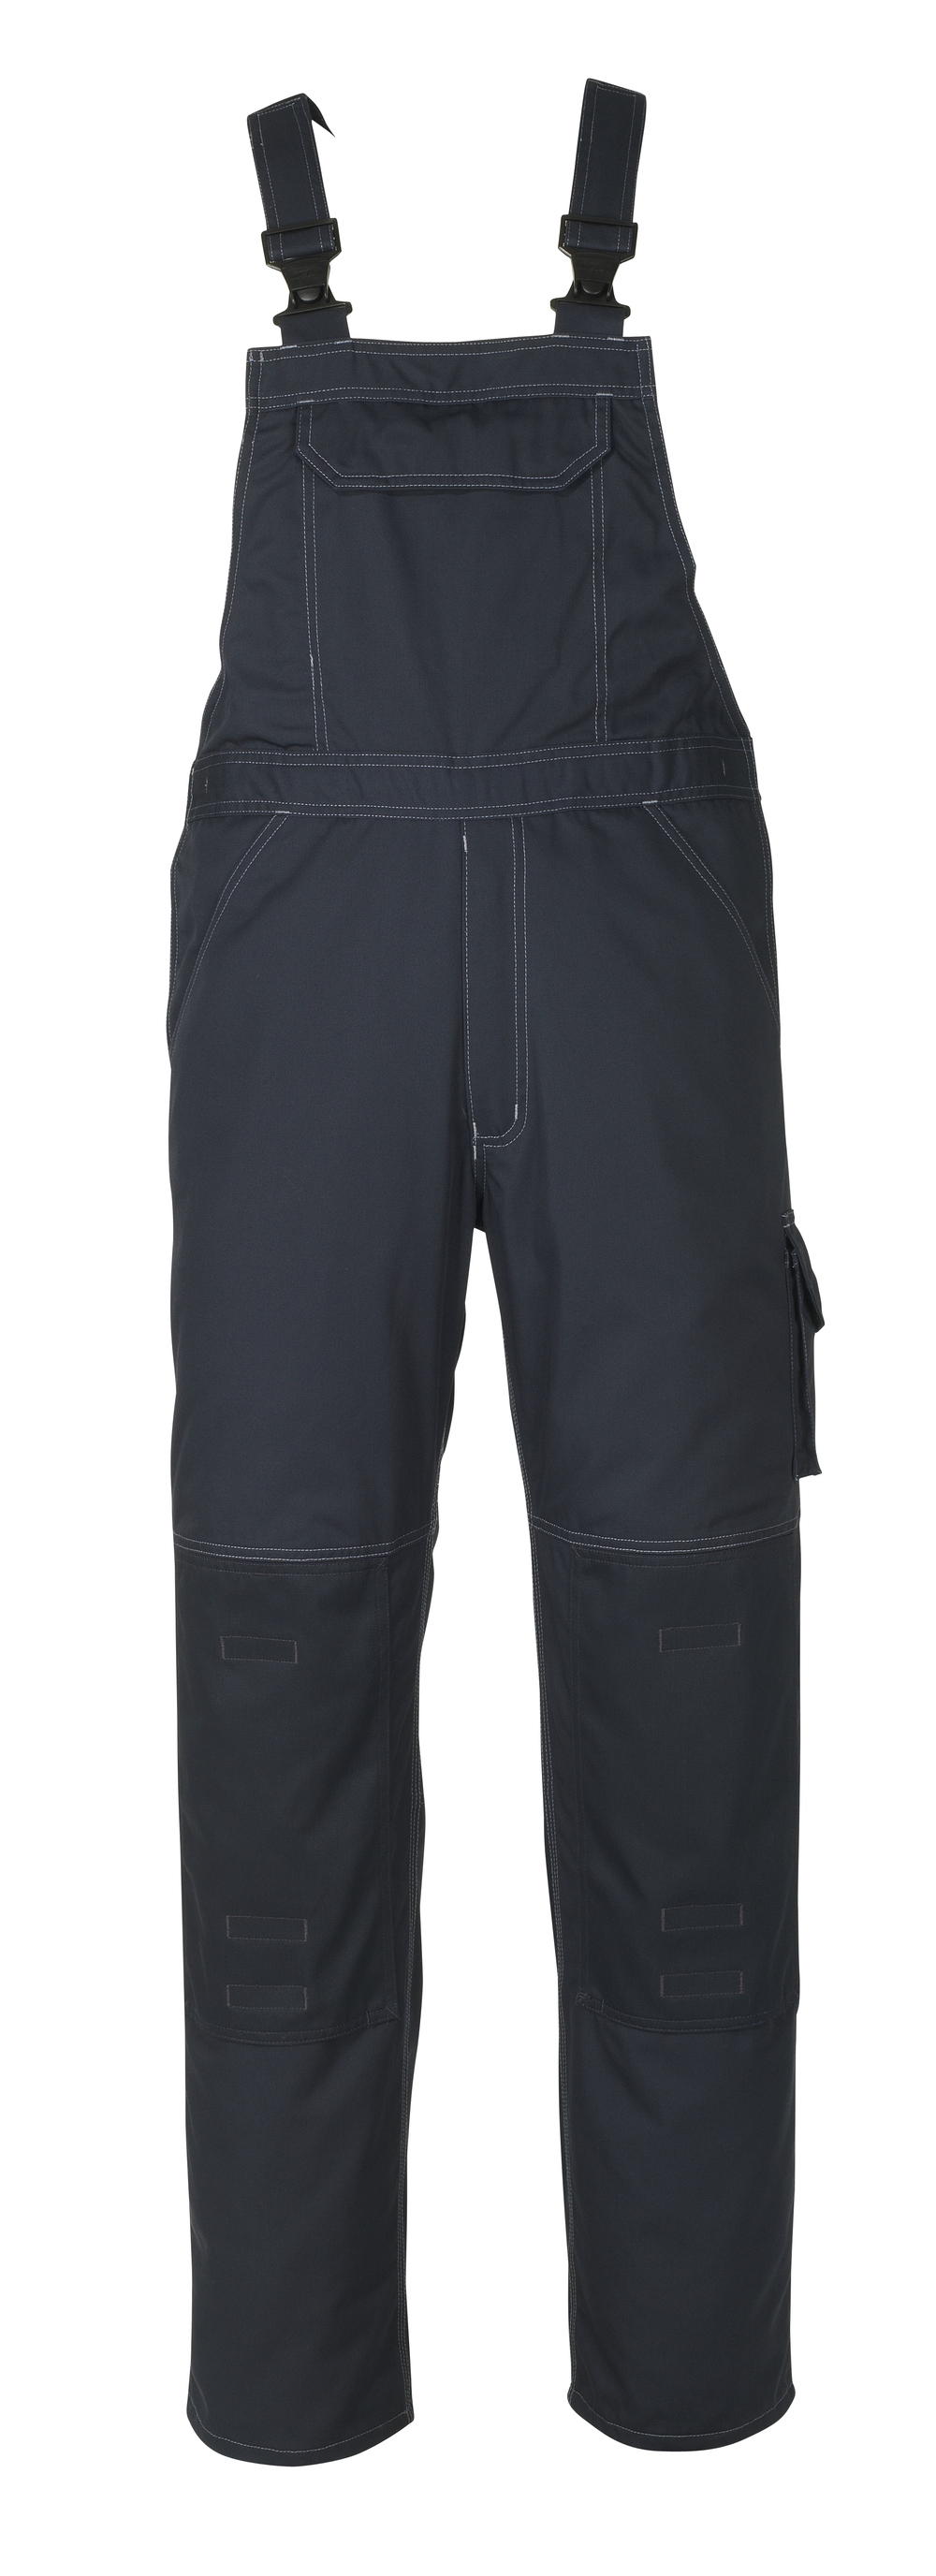 10569-442-010 Overall med knelommer - mørk marine